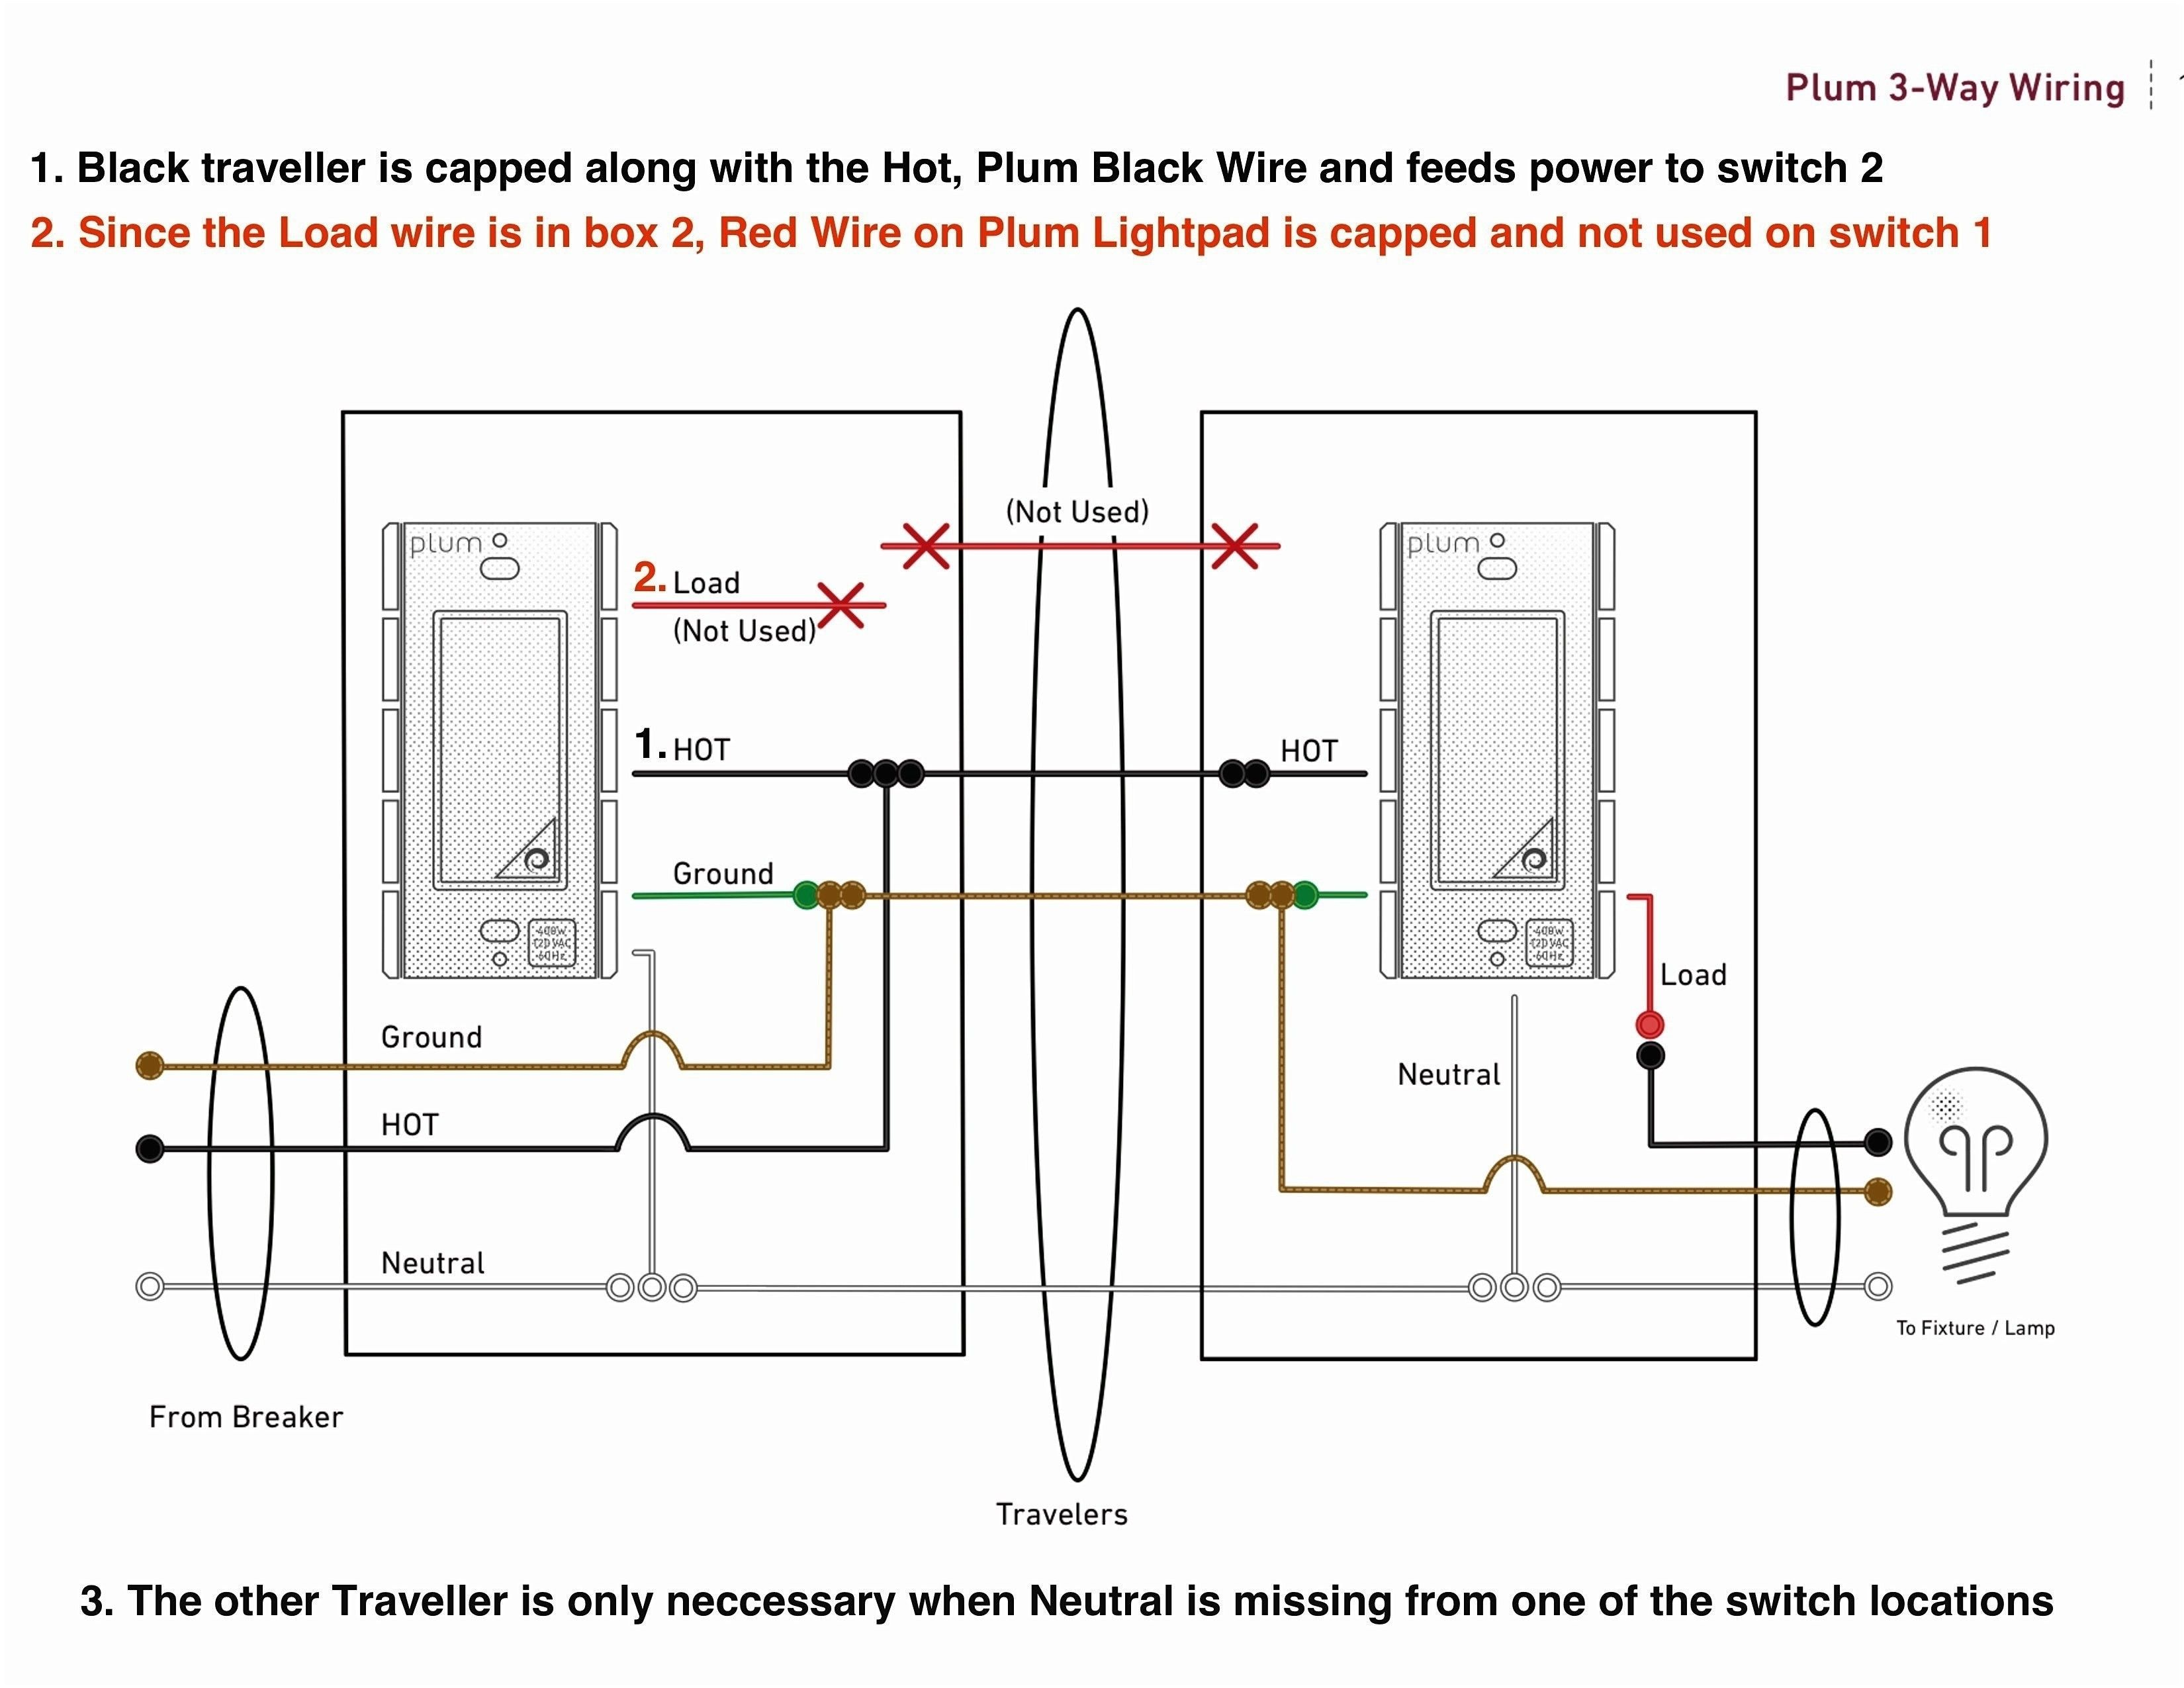 Elegant Leviton Lighted Switch Wiring Diagram In 2020 Light Switch Wiring 3 Way Switch Wiring Electrical Wiring Diagram